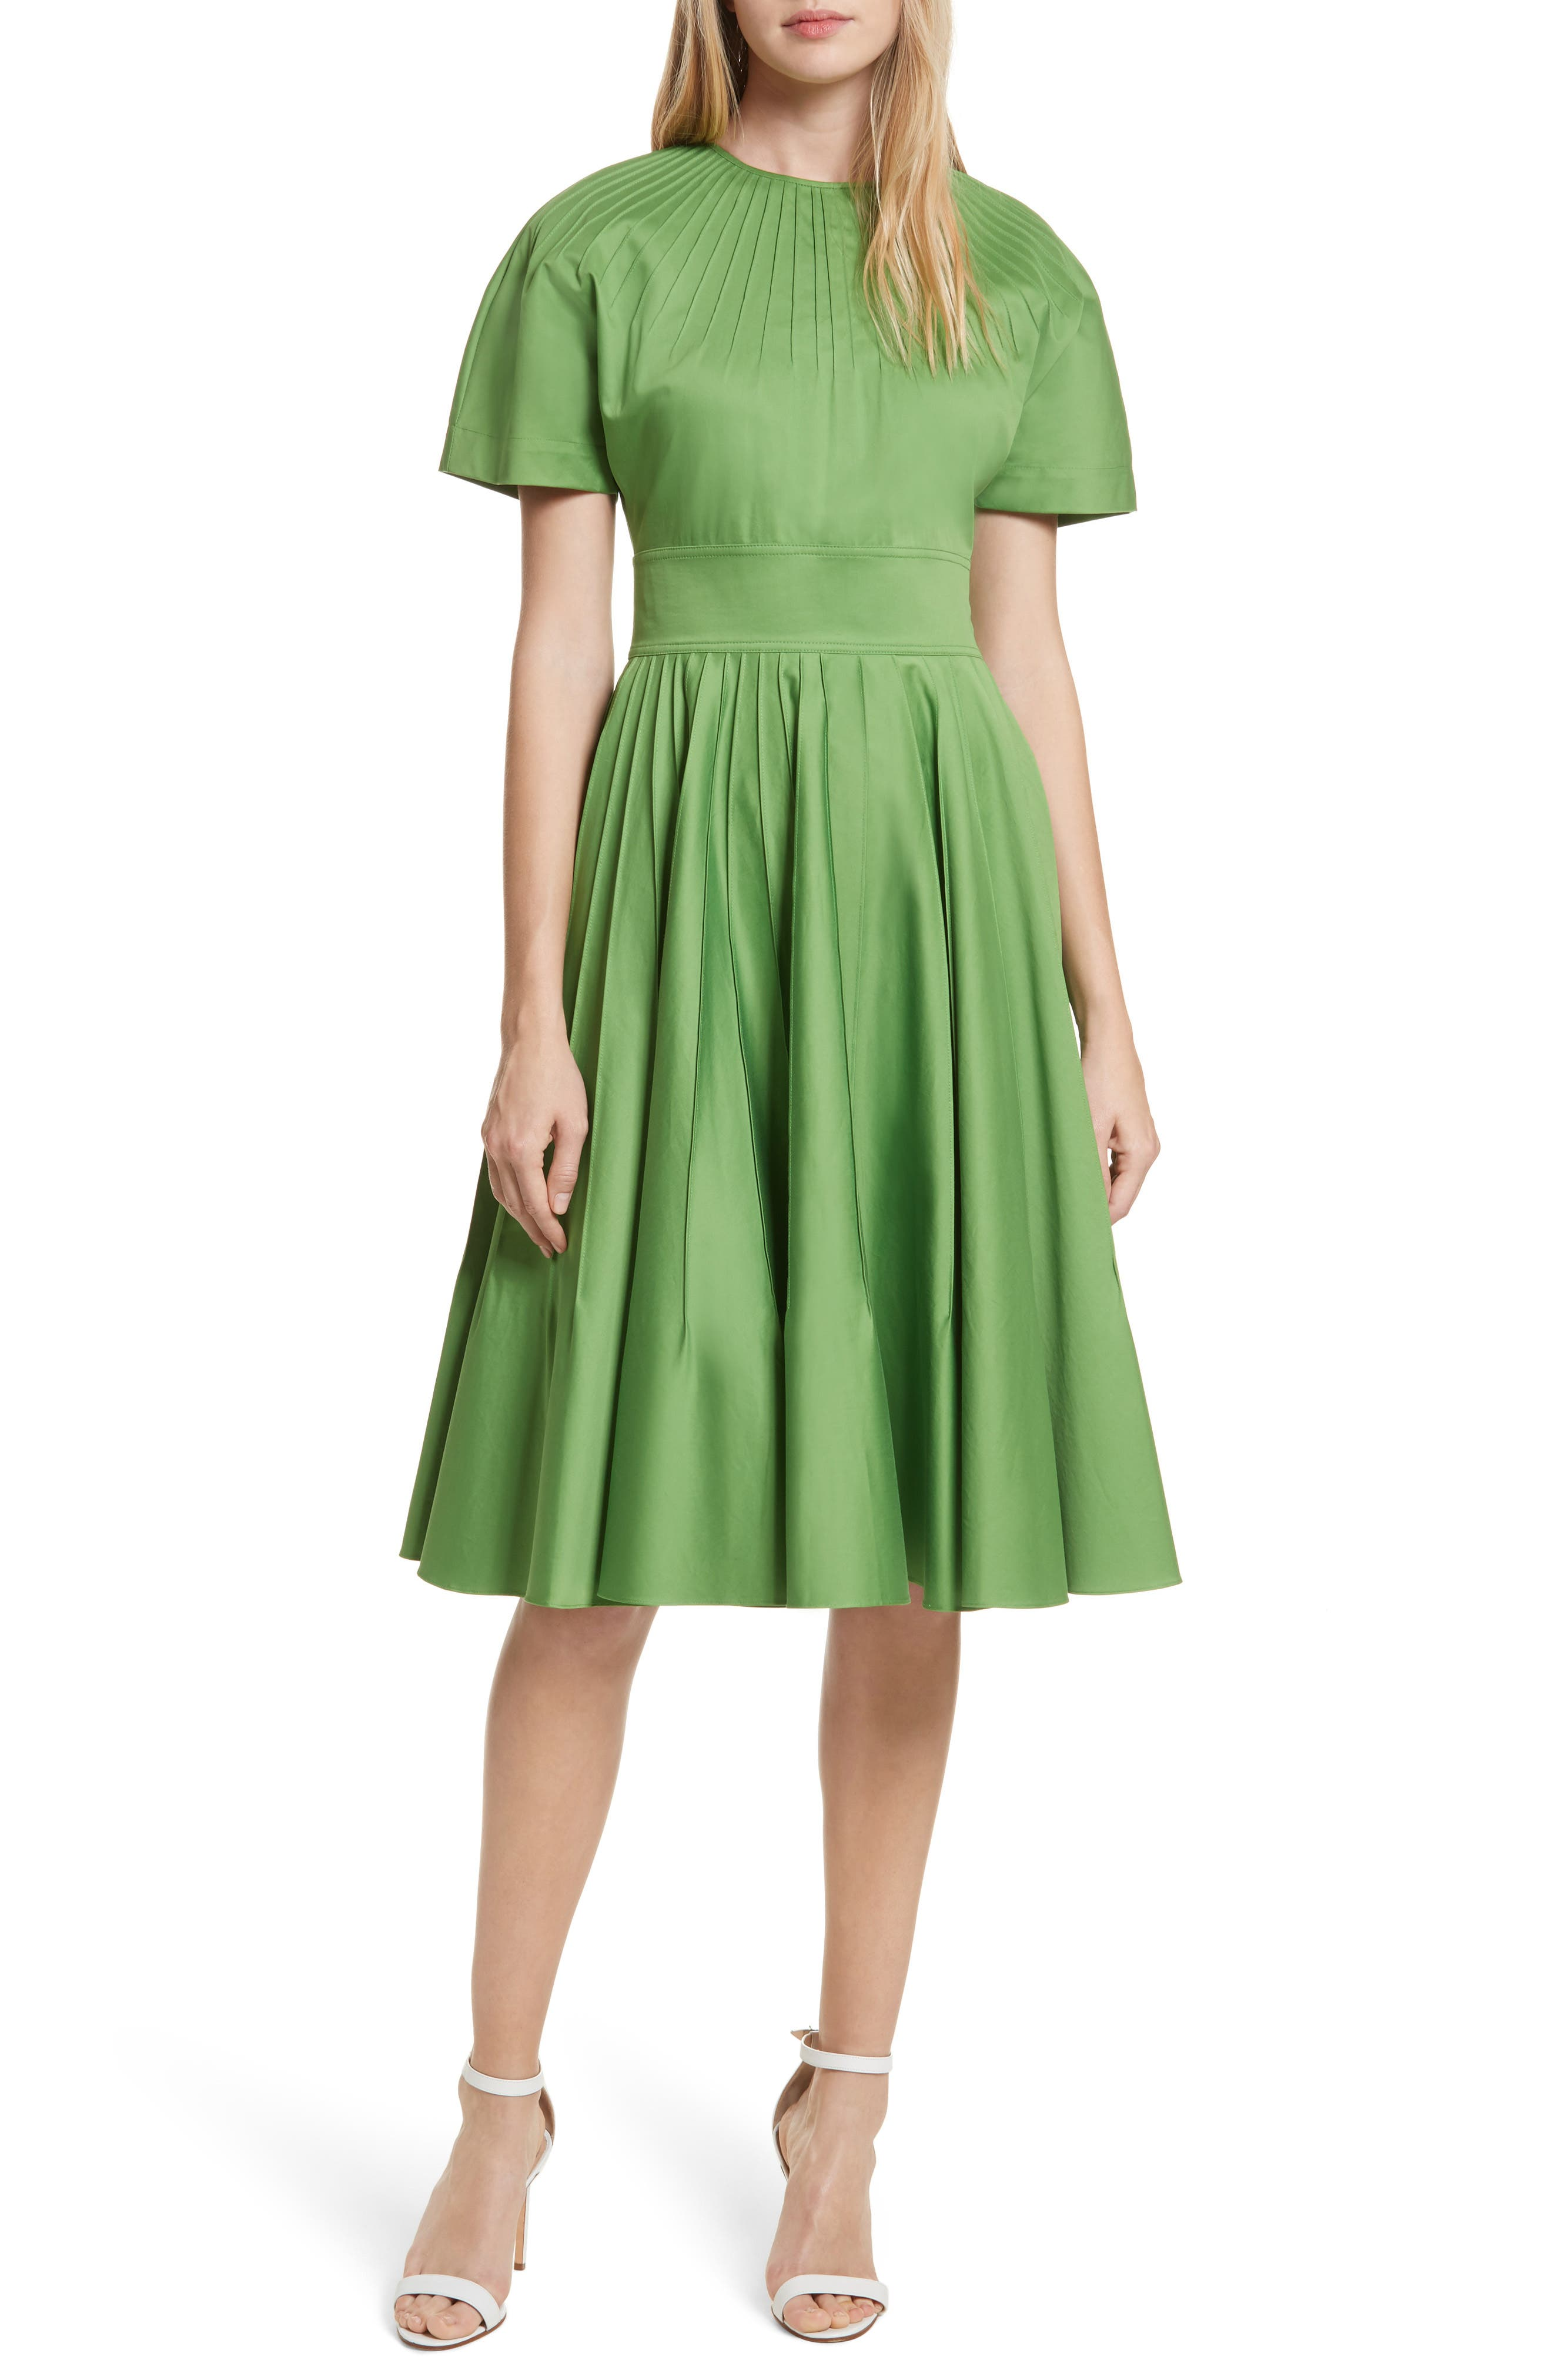 Diane von Furstenberg Pintuck Dress,                             Main thumbnail 1, color,                             Grass